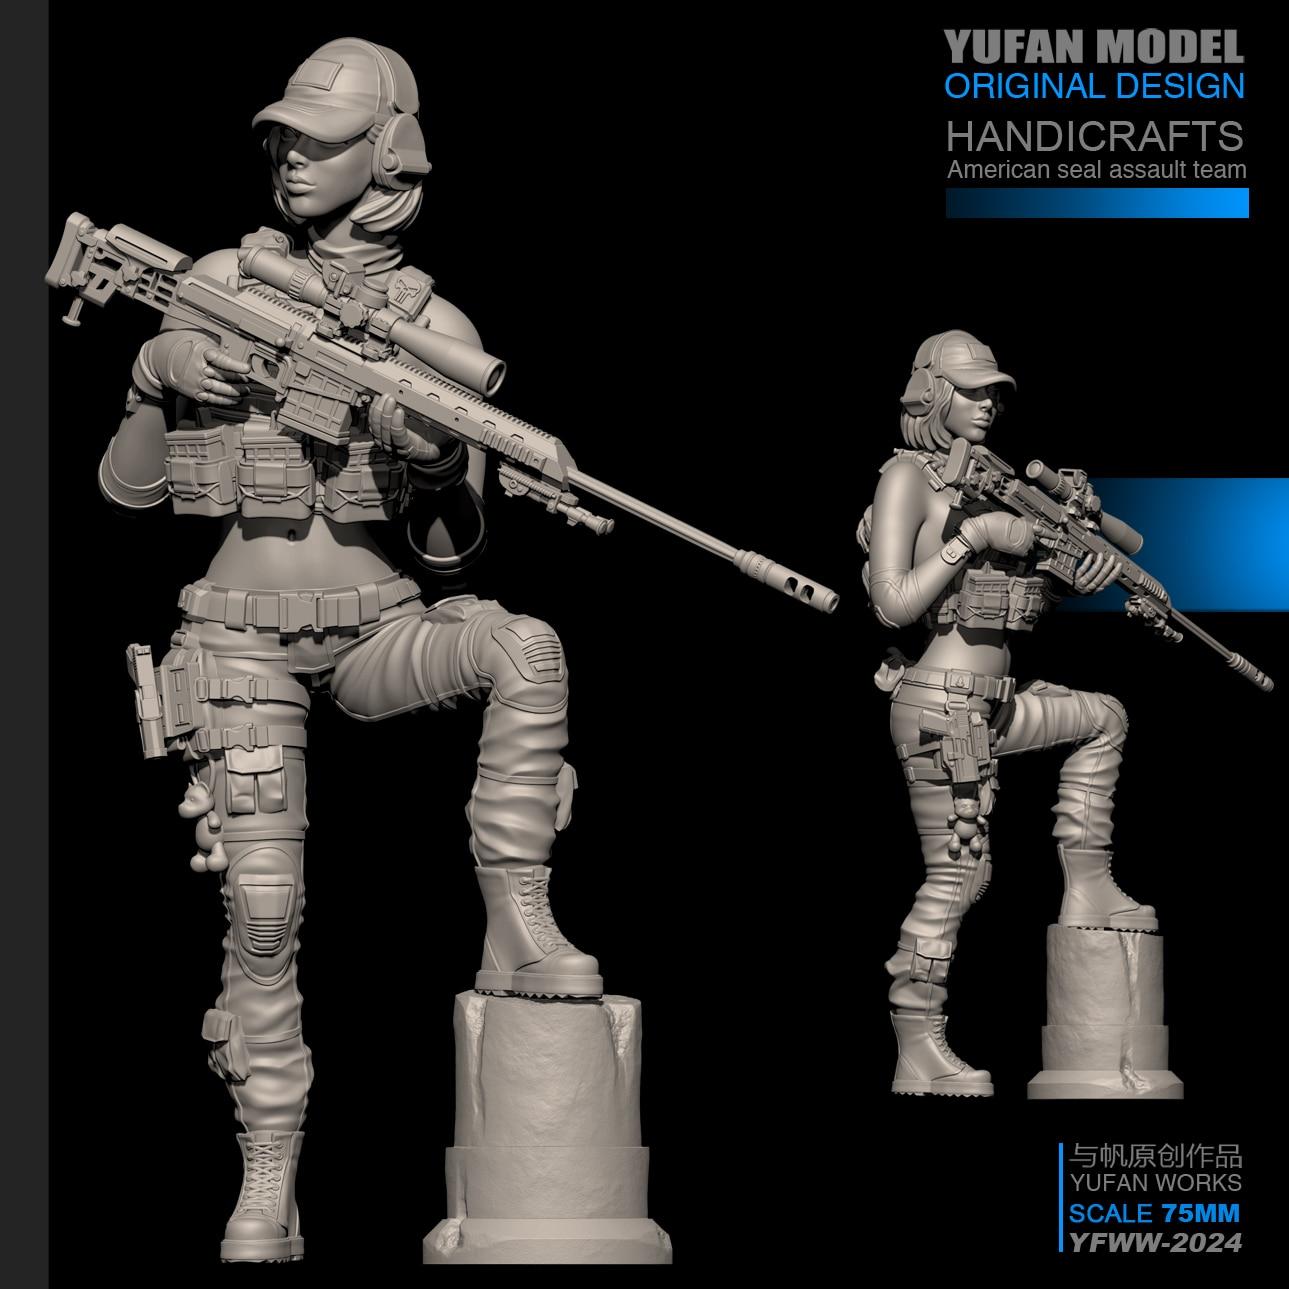 YUFan Model 1/24 Female Sniper Resin Soldier Self-assembled (75mm)YFWW-2024